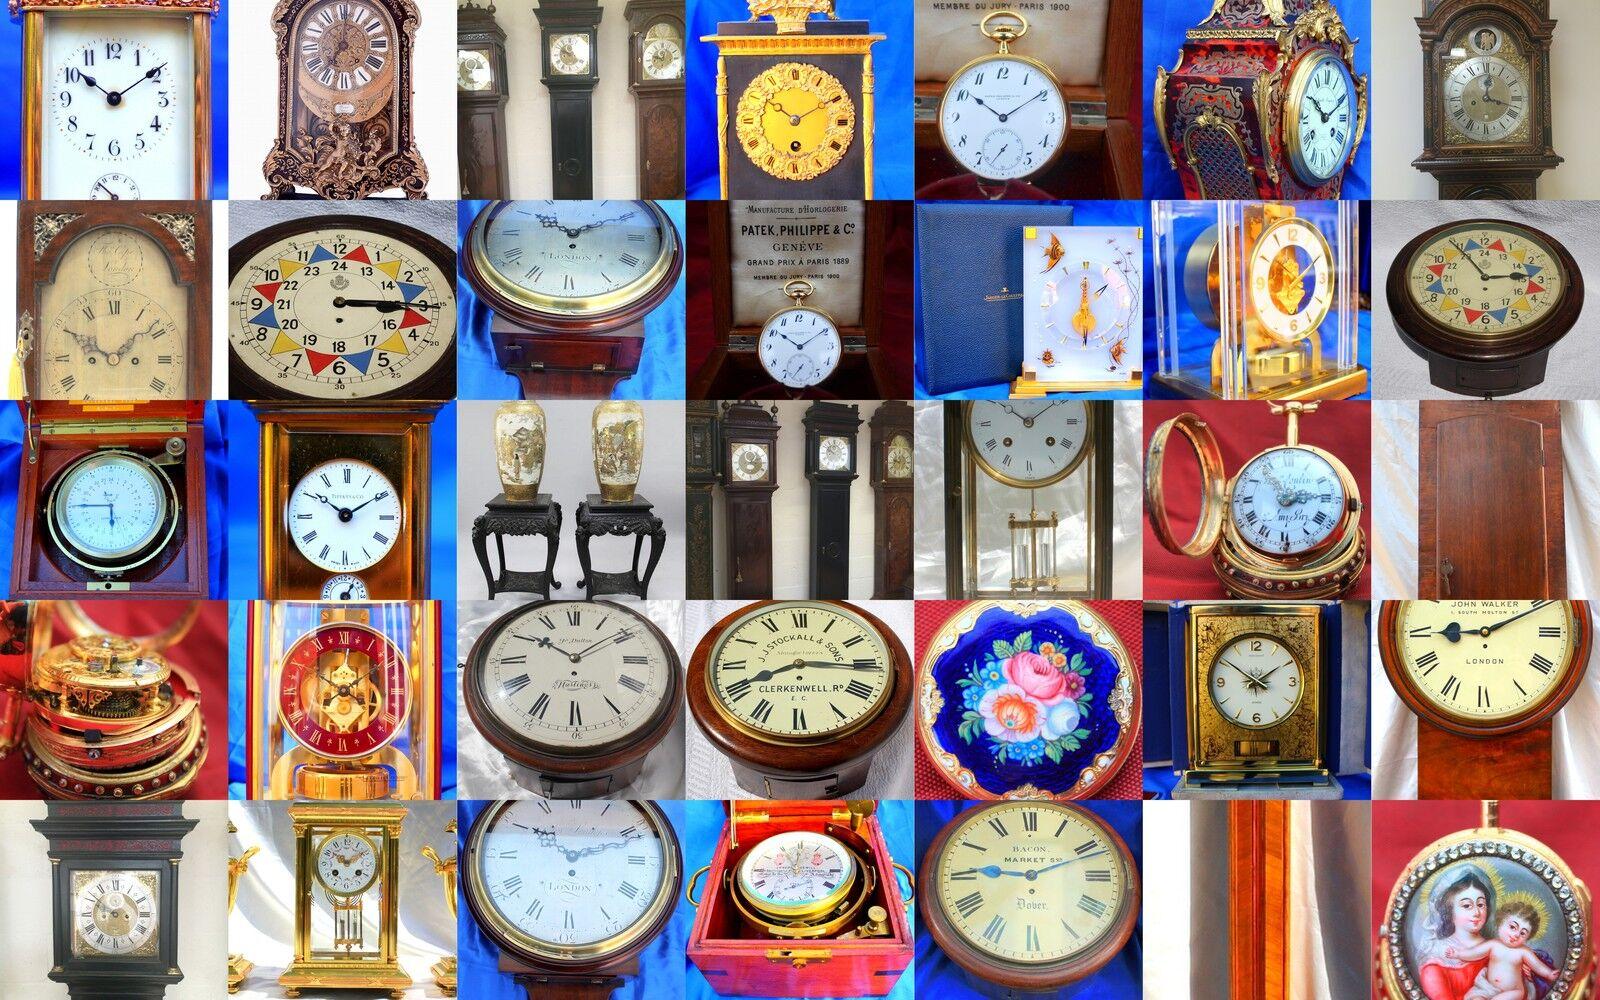 CANTERBURY CLOCKS & CURIOS